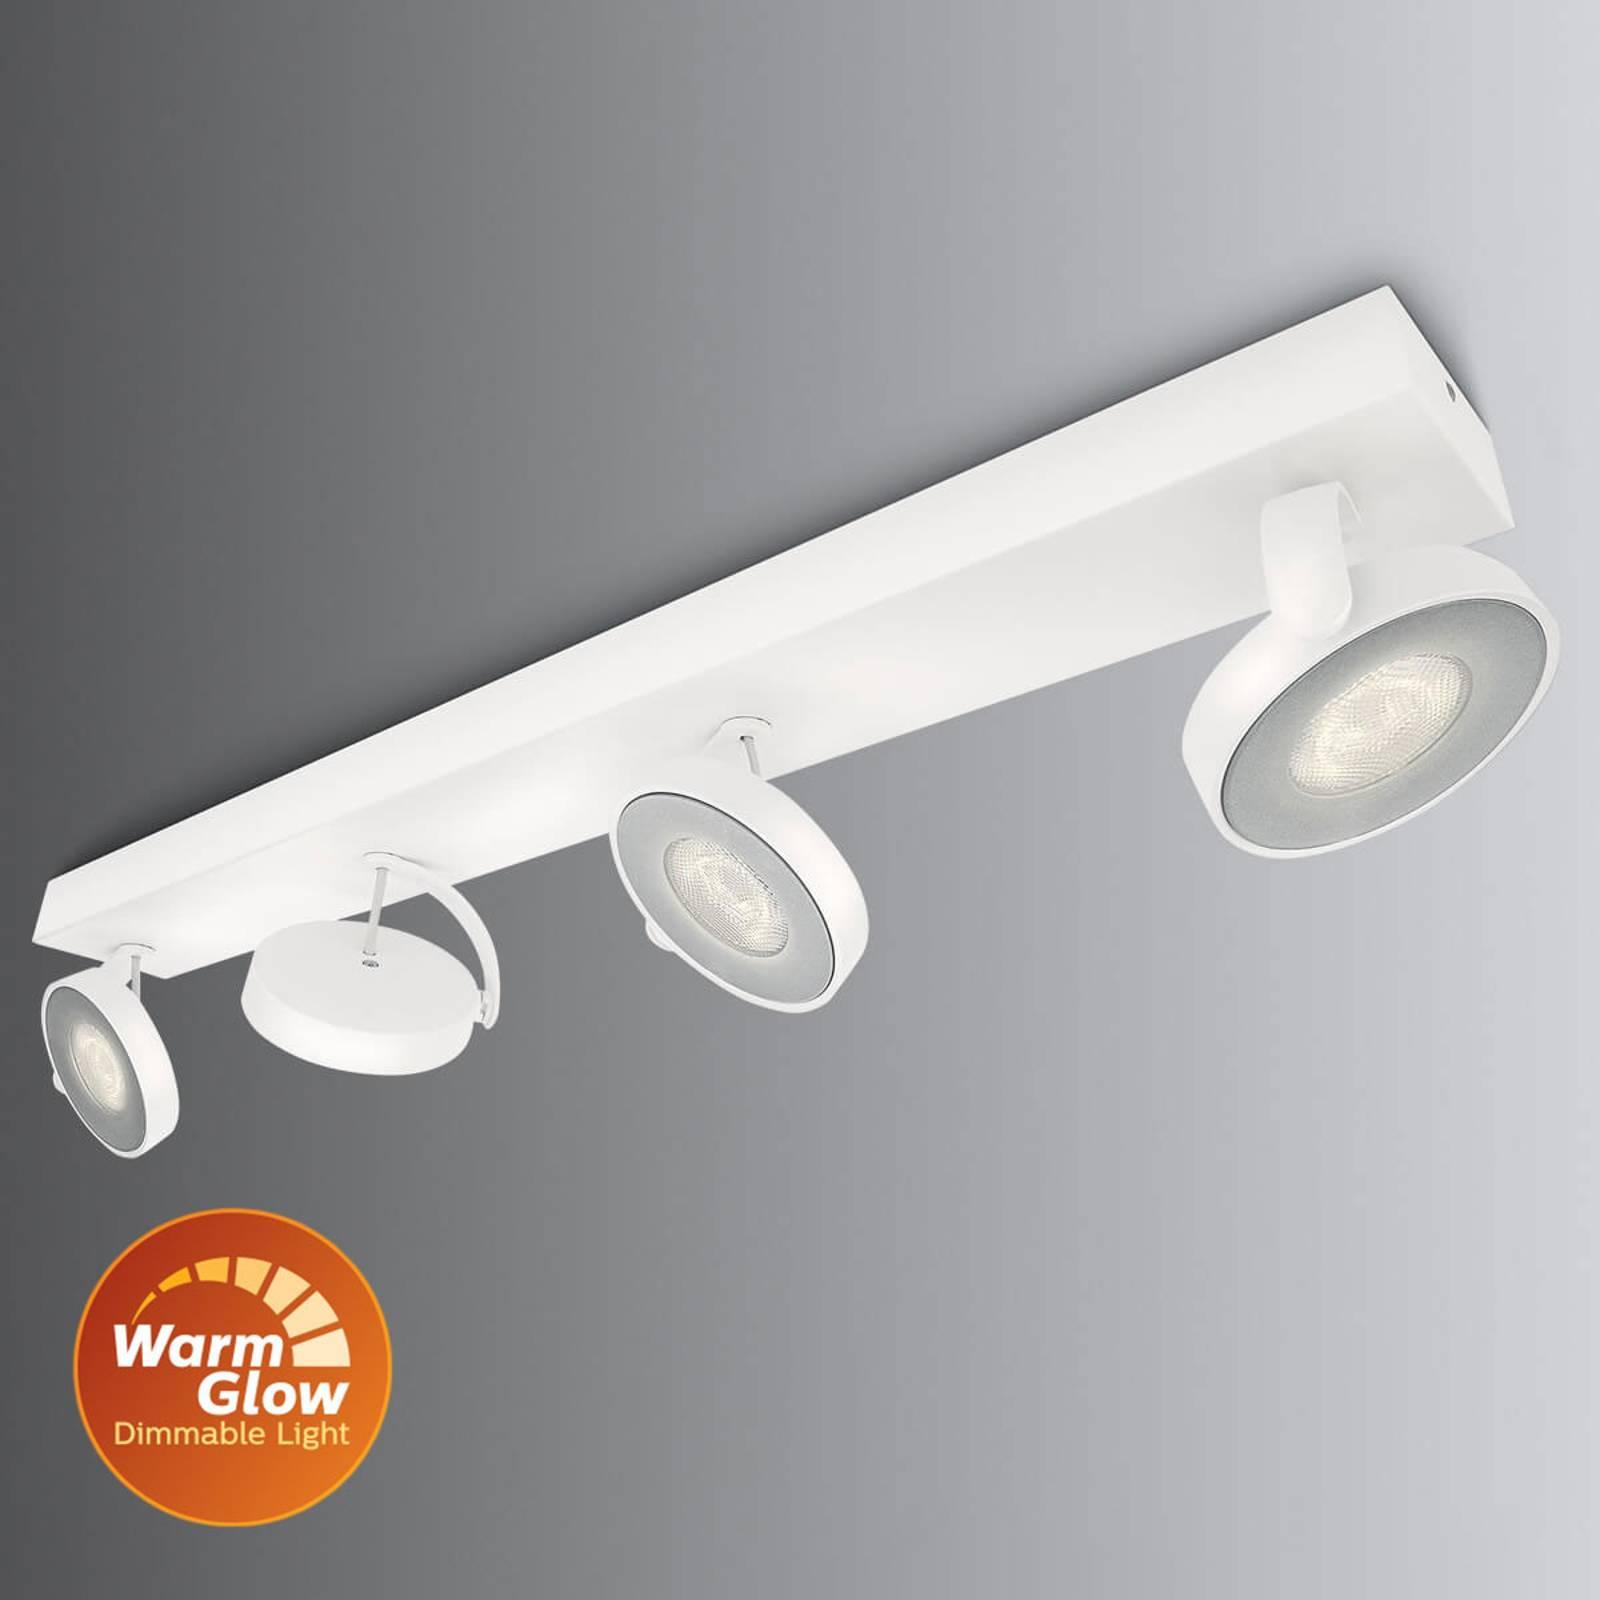 Warme verlichting - LED plafondspots Clockwork